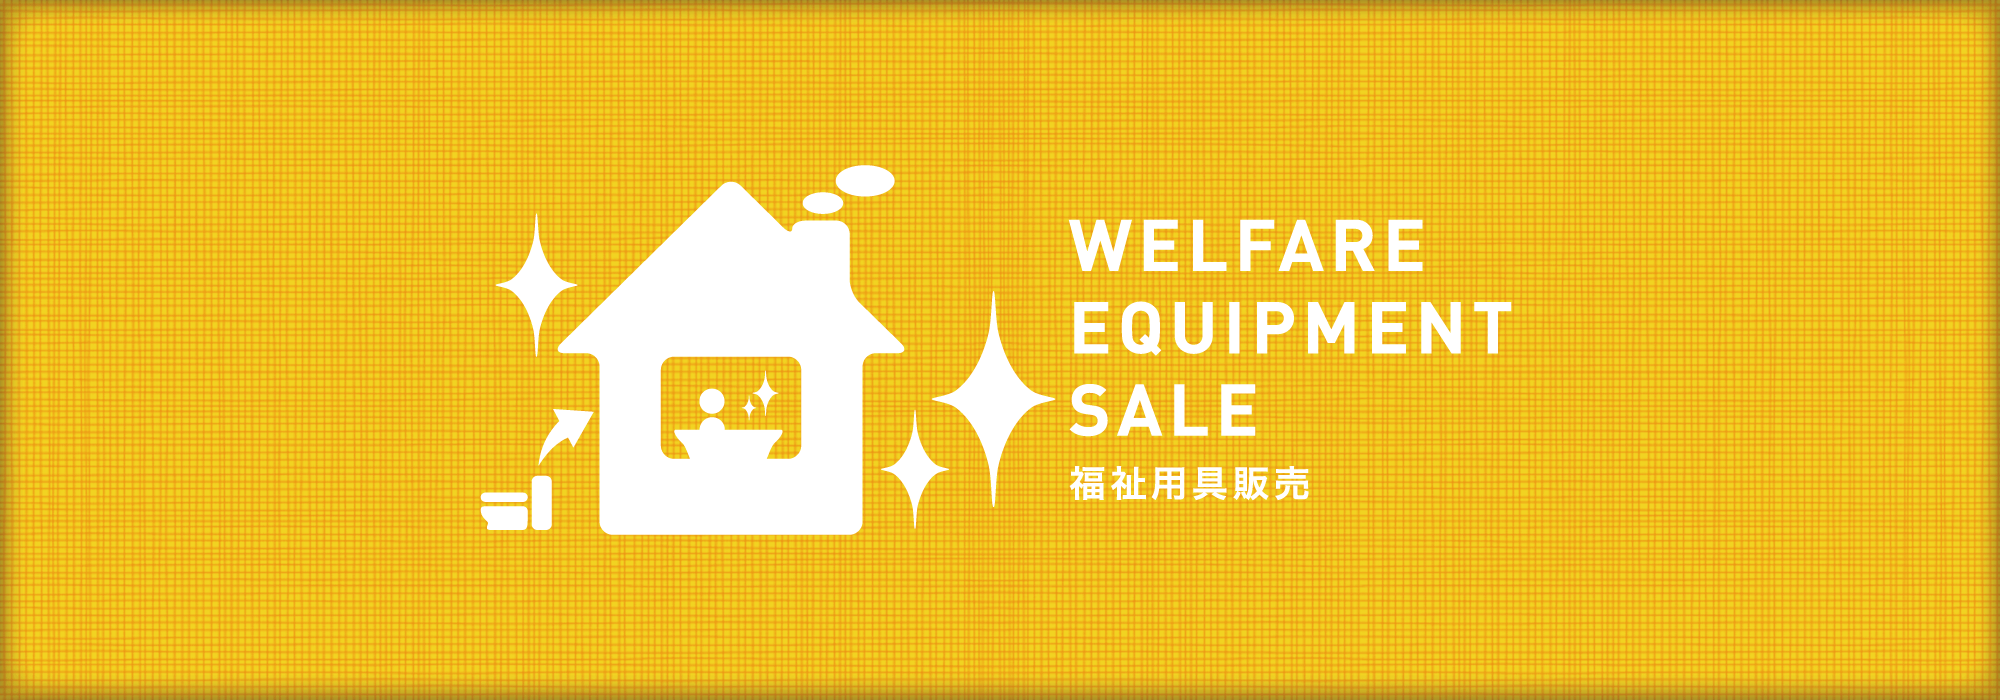 WELFARE EQUIPMENT SALE 福祉用具販売